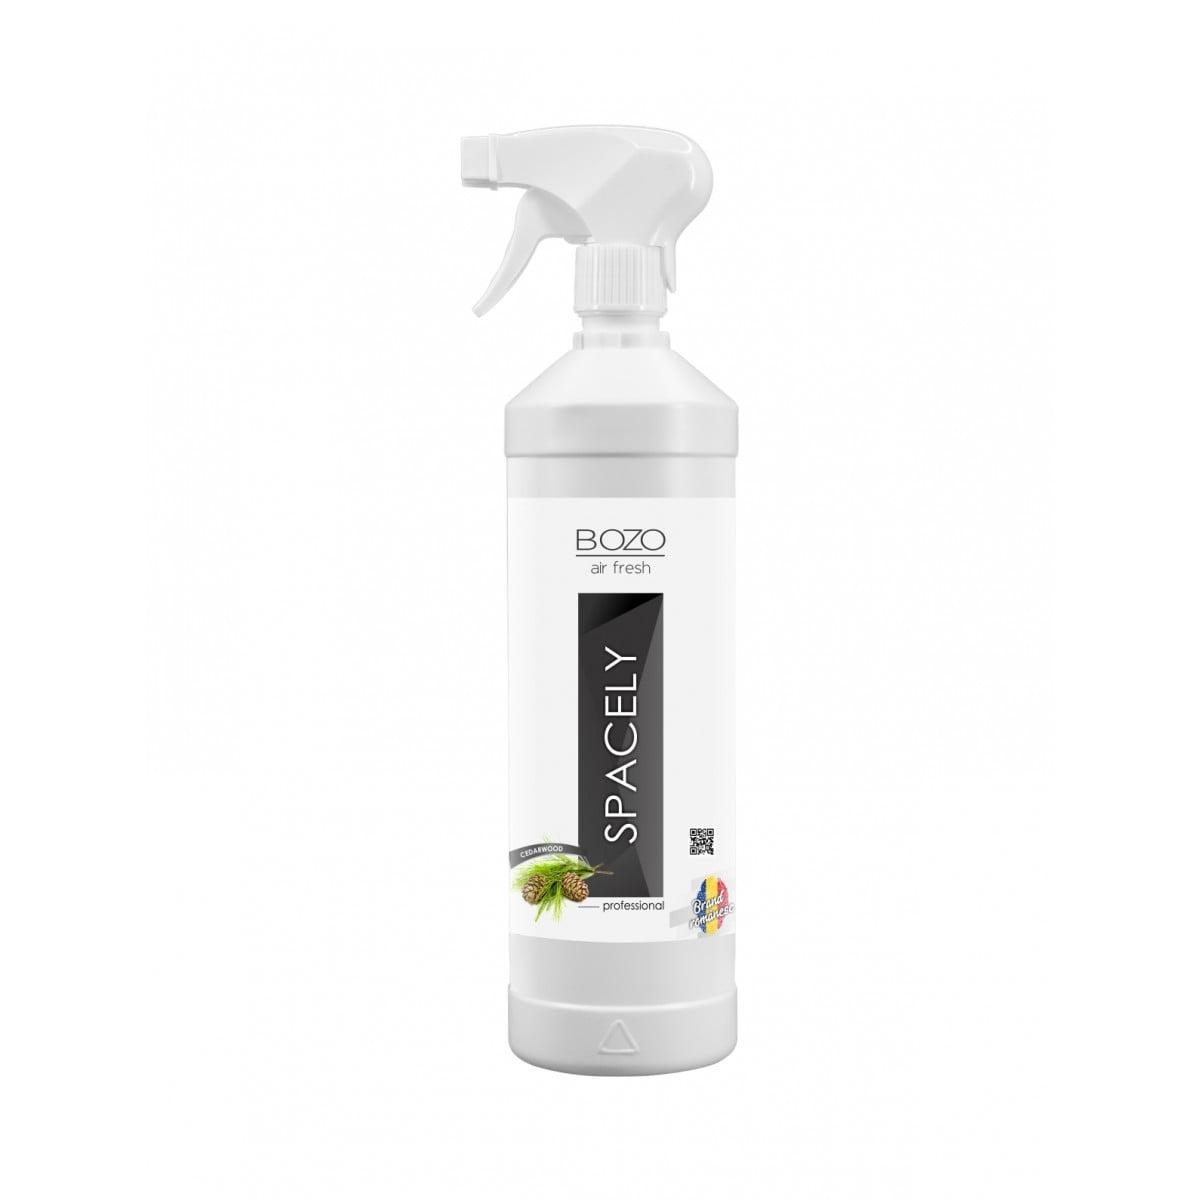 Odorizant ambiental concentrat cu aroma cedru, Bozo Air Fresh - Spacely, Cedarwood - 1000ml imagine 2021 somnart.ro